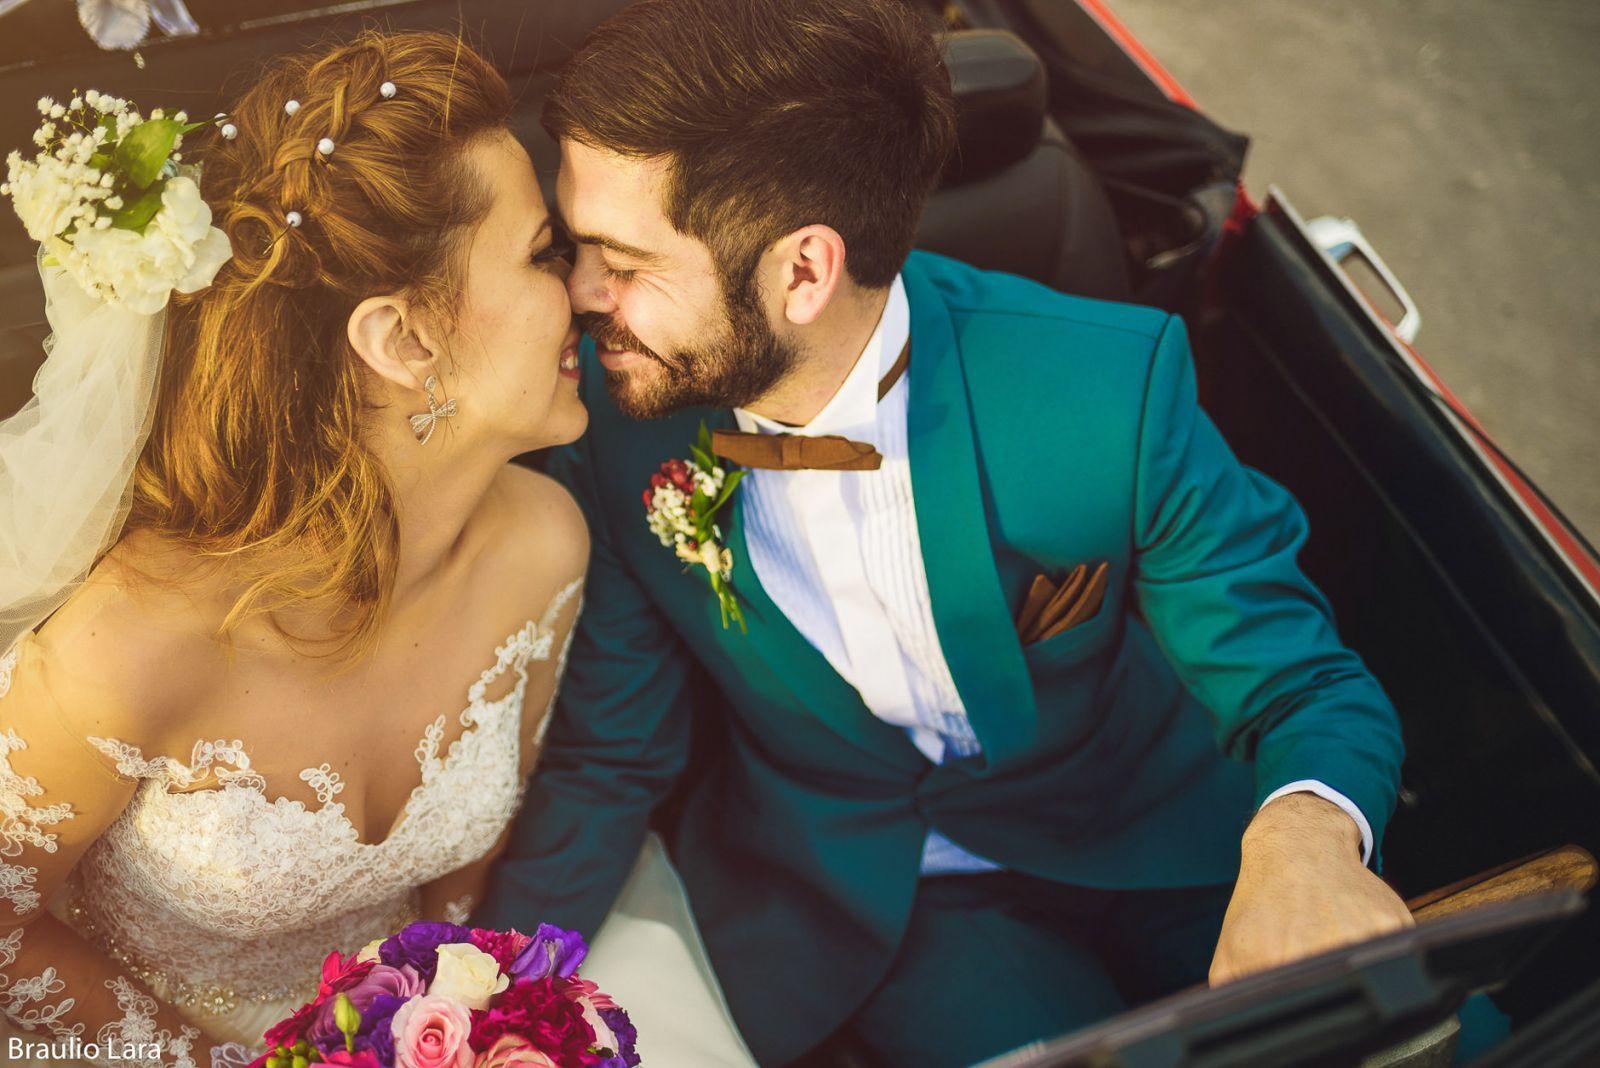 photographer in Prague - photoshoot in prague wedding photo localgrapher brauliolara braulio lara brauliolaraph photo session couple www.brauliolaraph.com